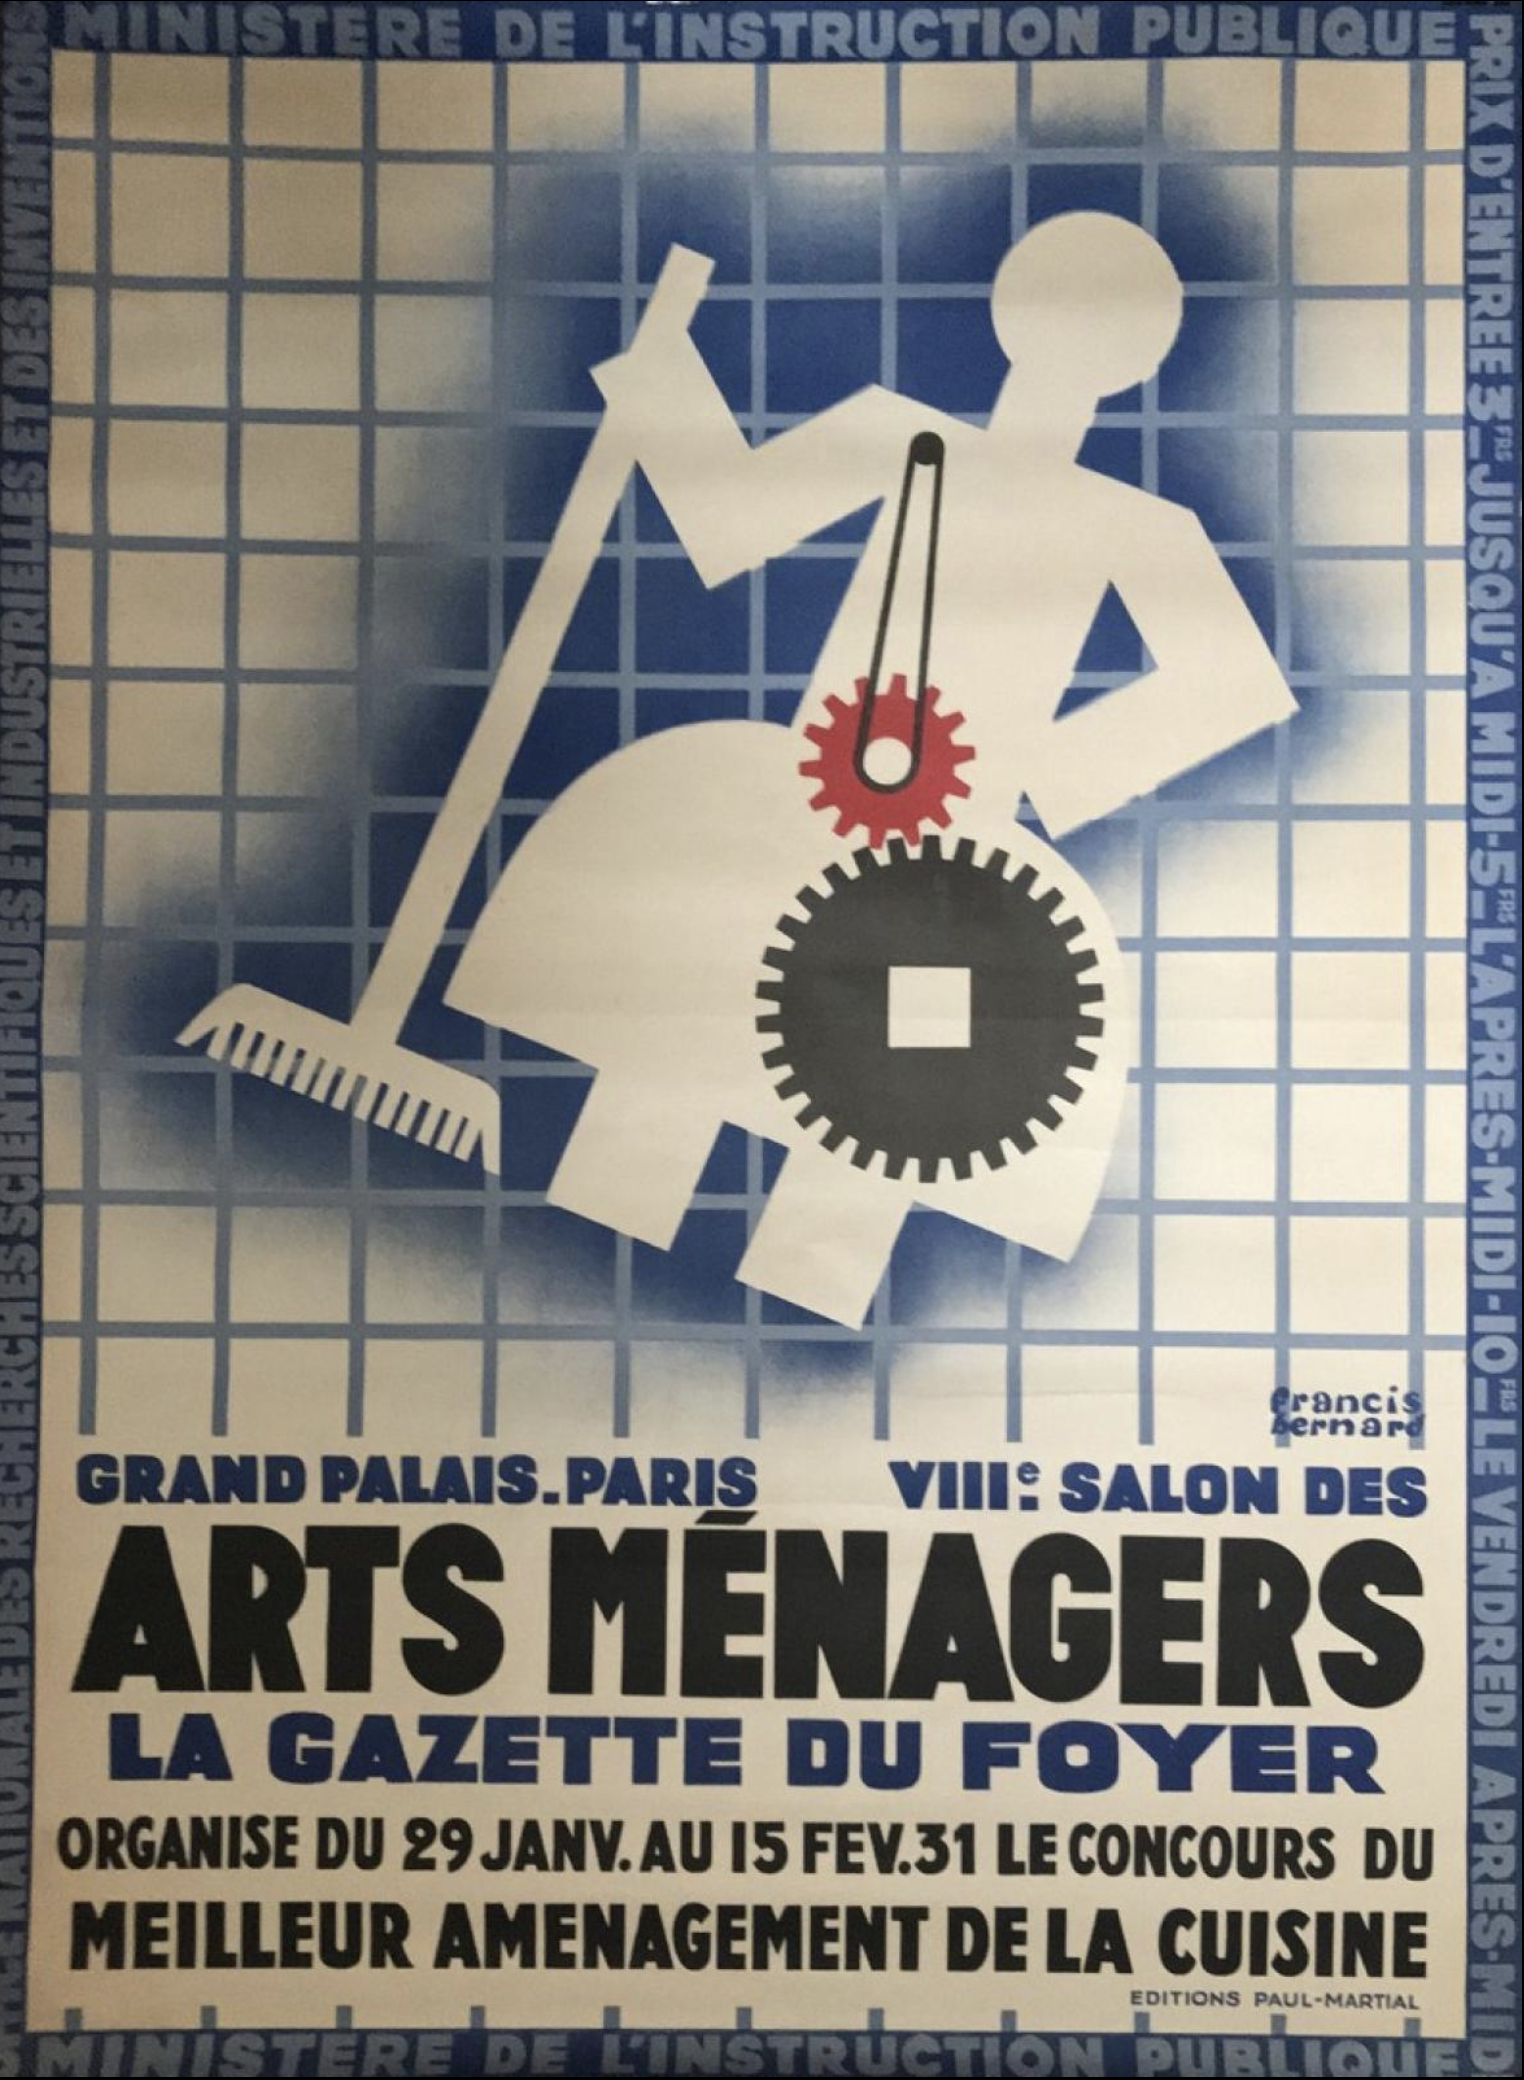 Arts Menagers Grand Palais 1931 by Francis Bernard Original Vintage Poster